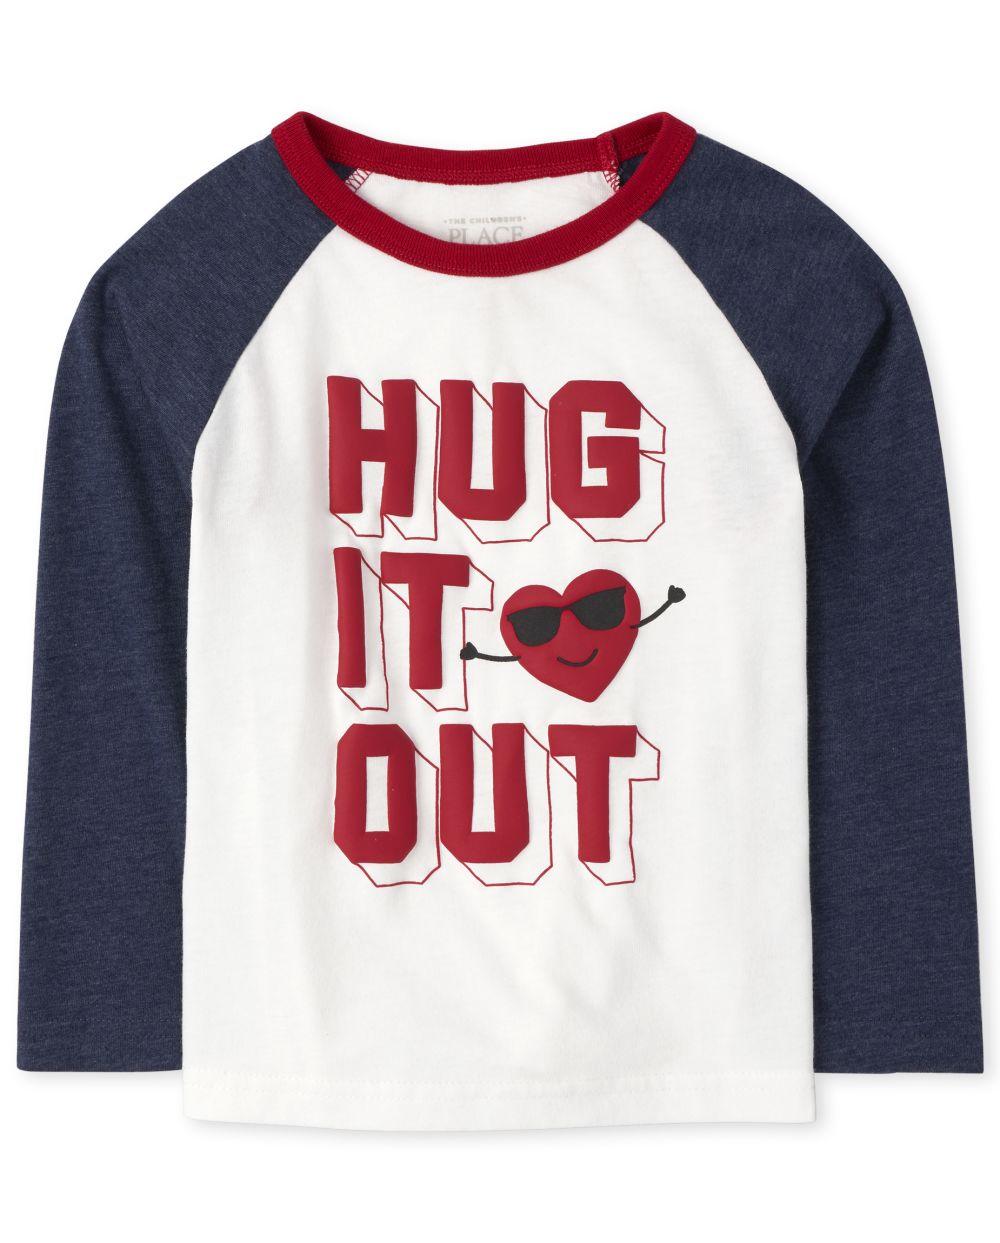 Toddler Boys Hug It Out Raglan Top